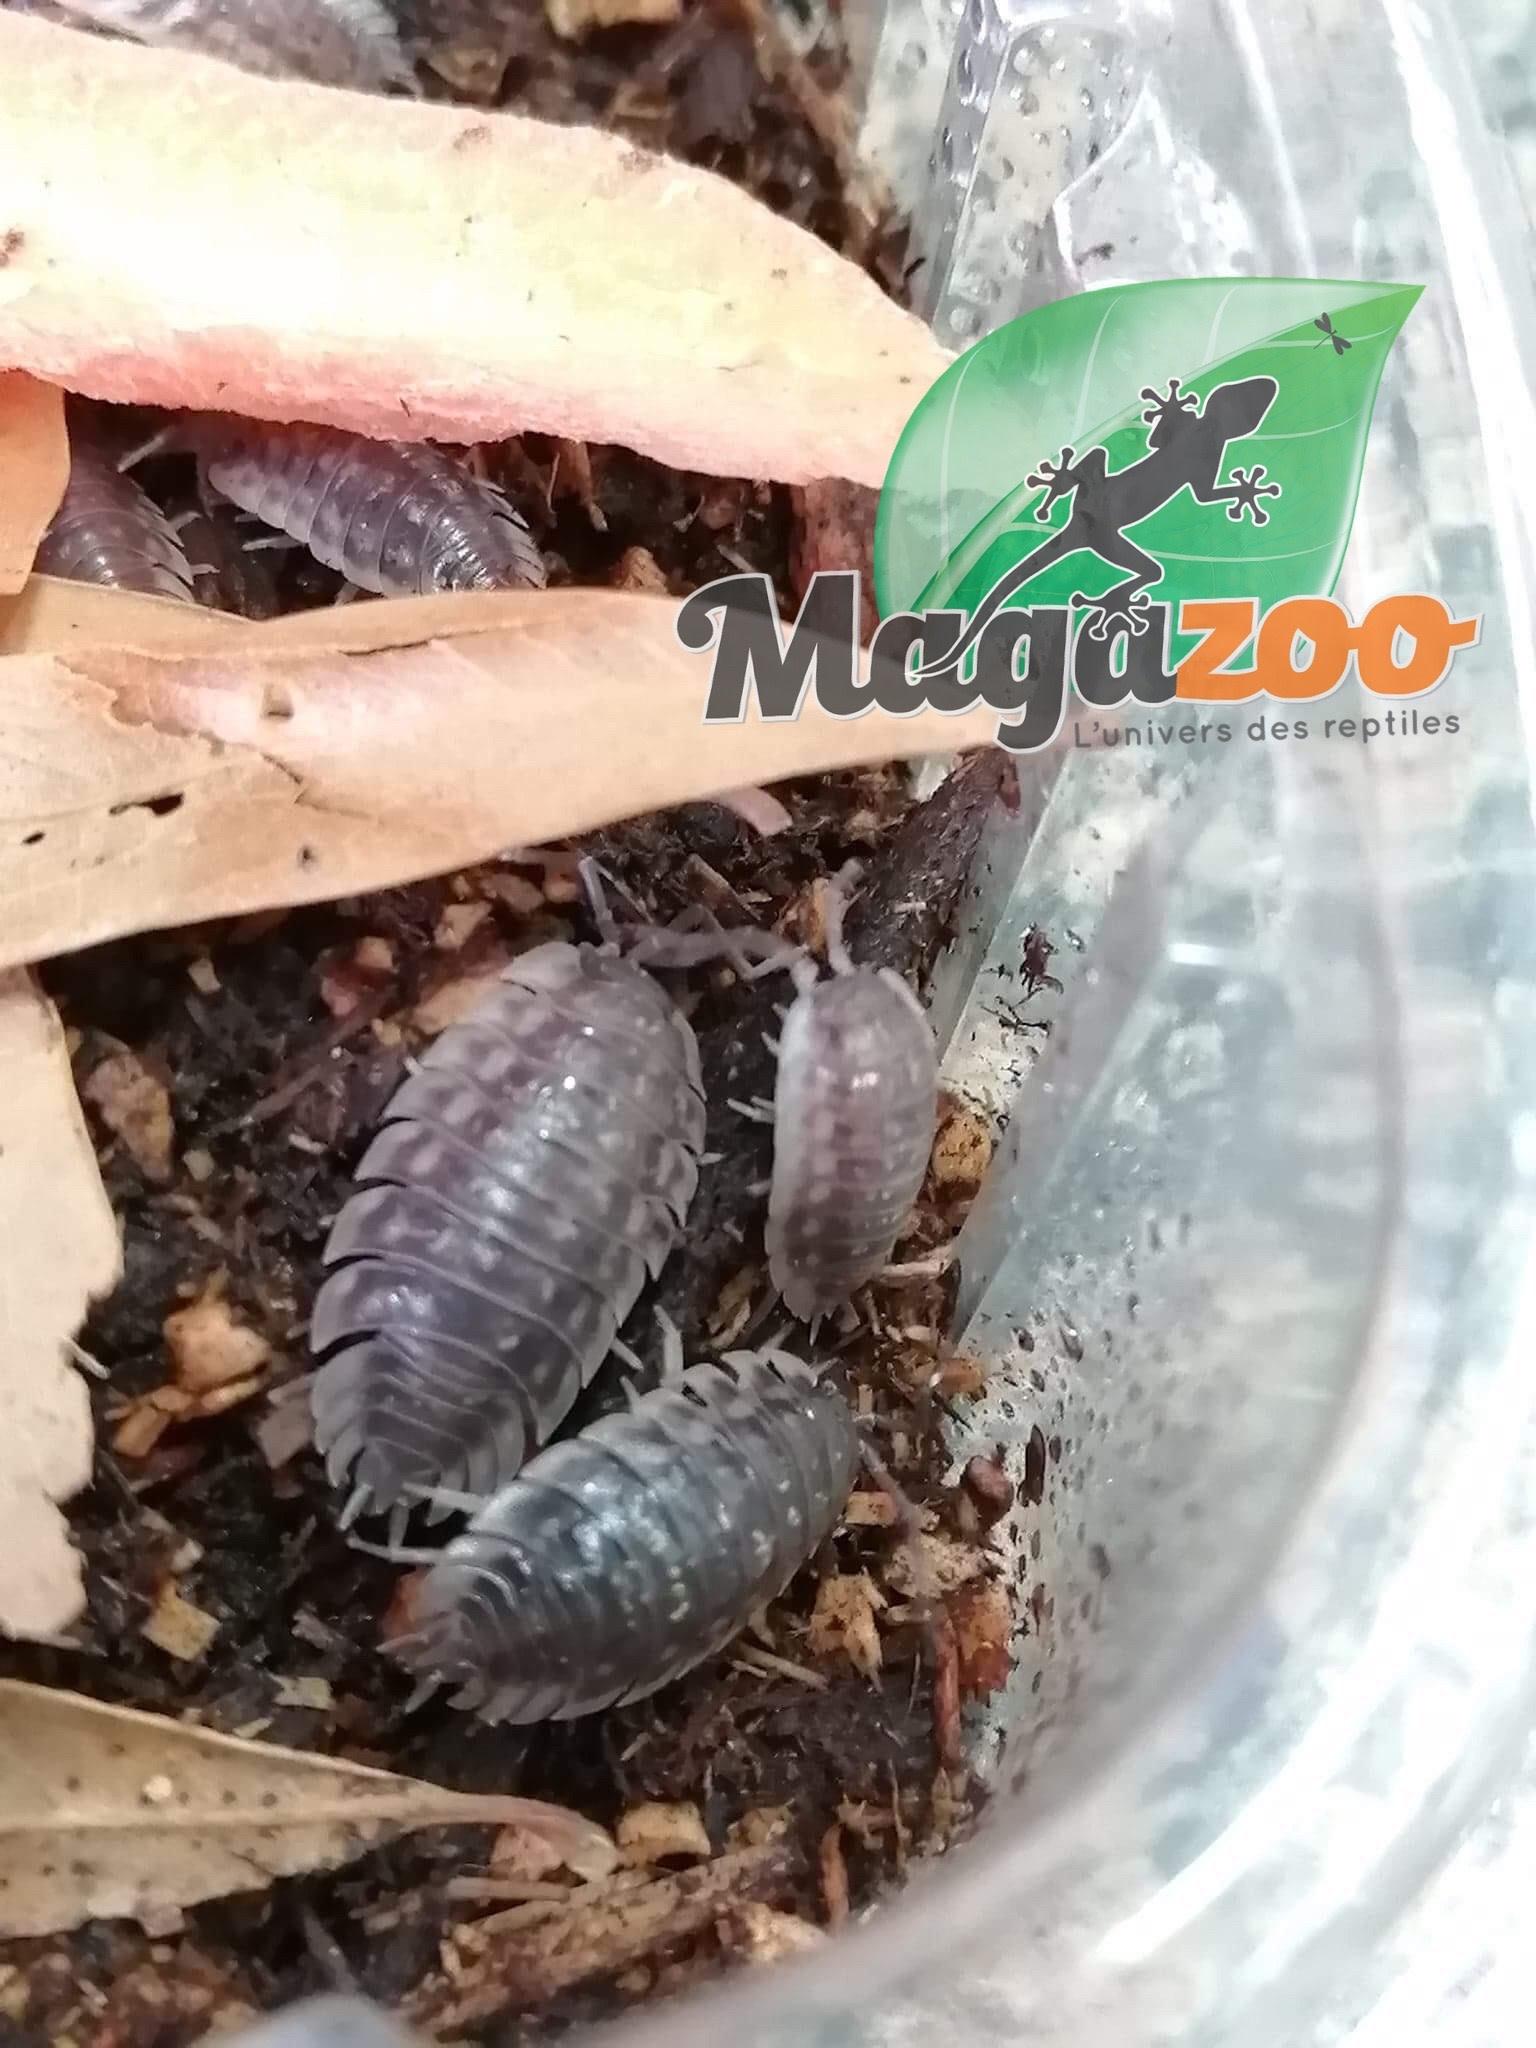 Magazoo Culture de Cloporte Isopod Oniscus Asellus Skirted 10 pack